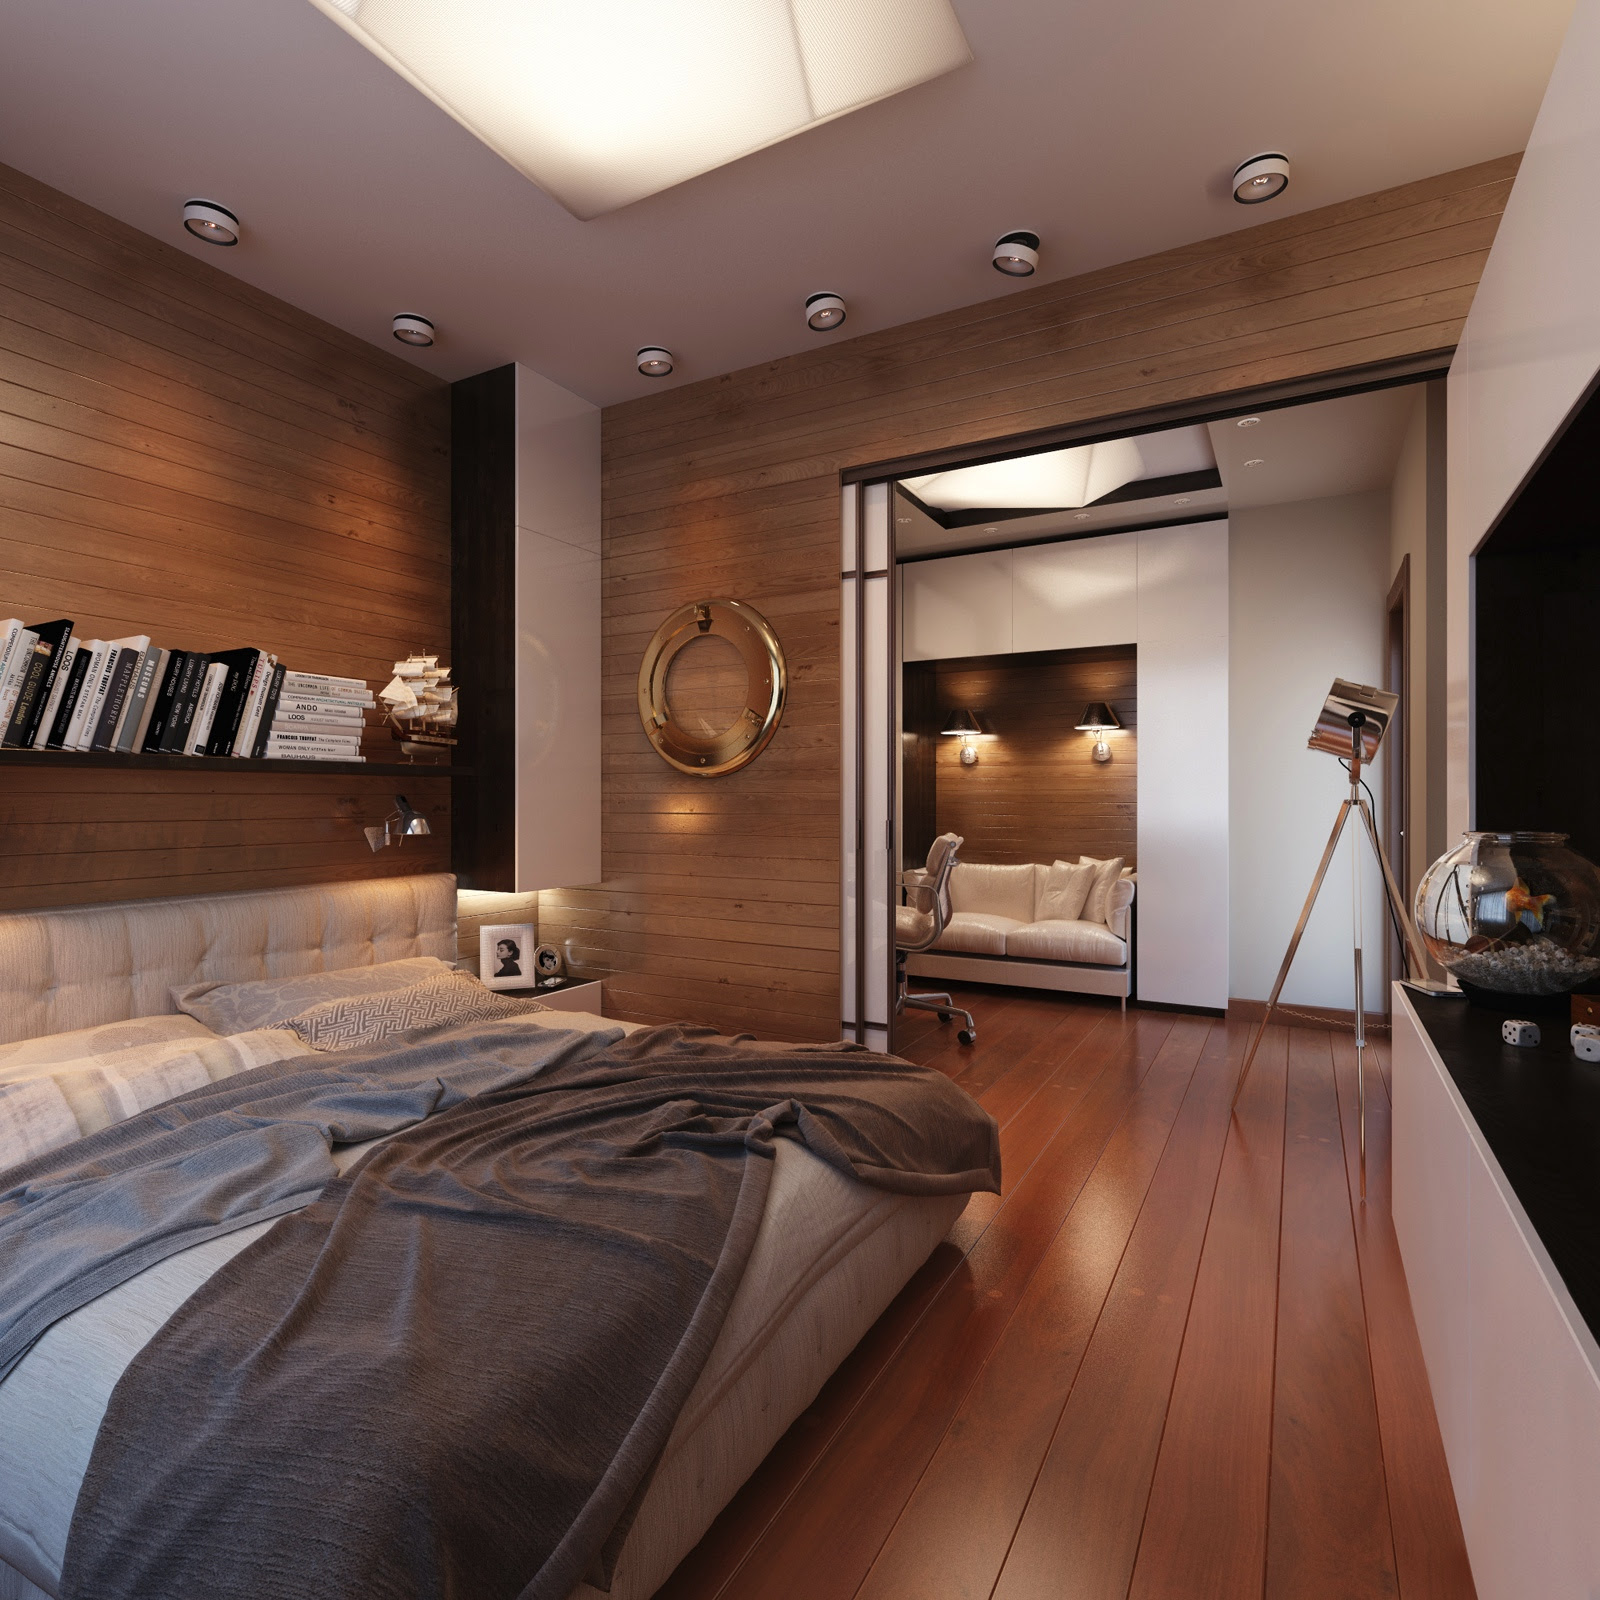 Yacht Style Bedroominterior Design Ideas